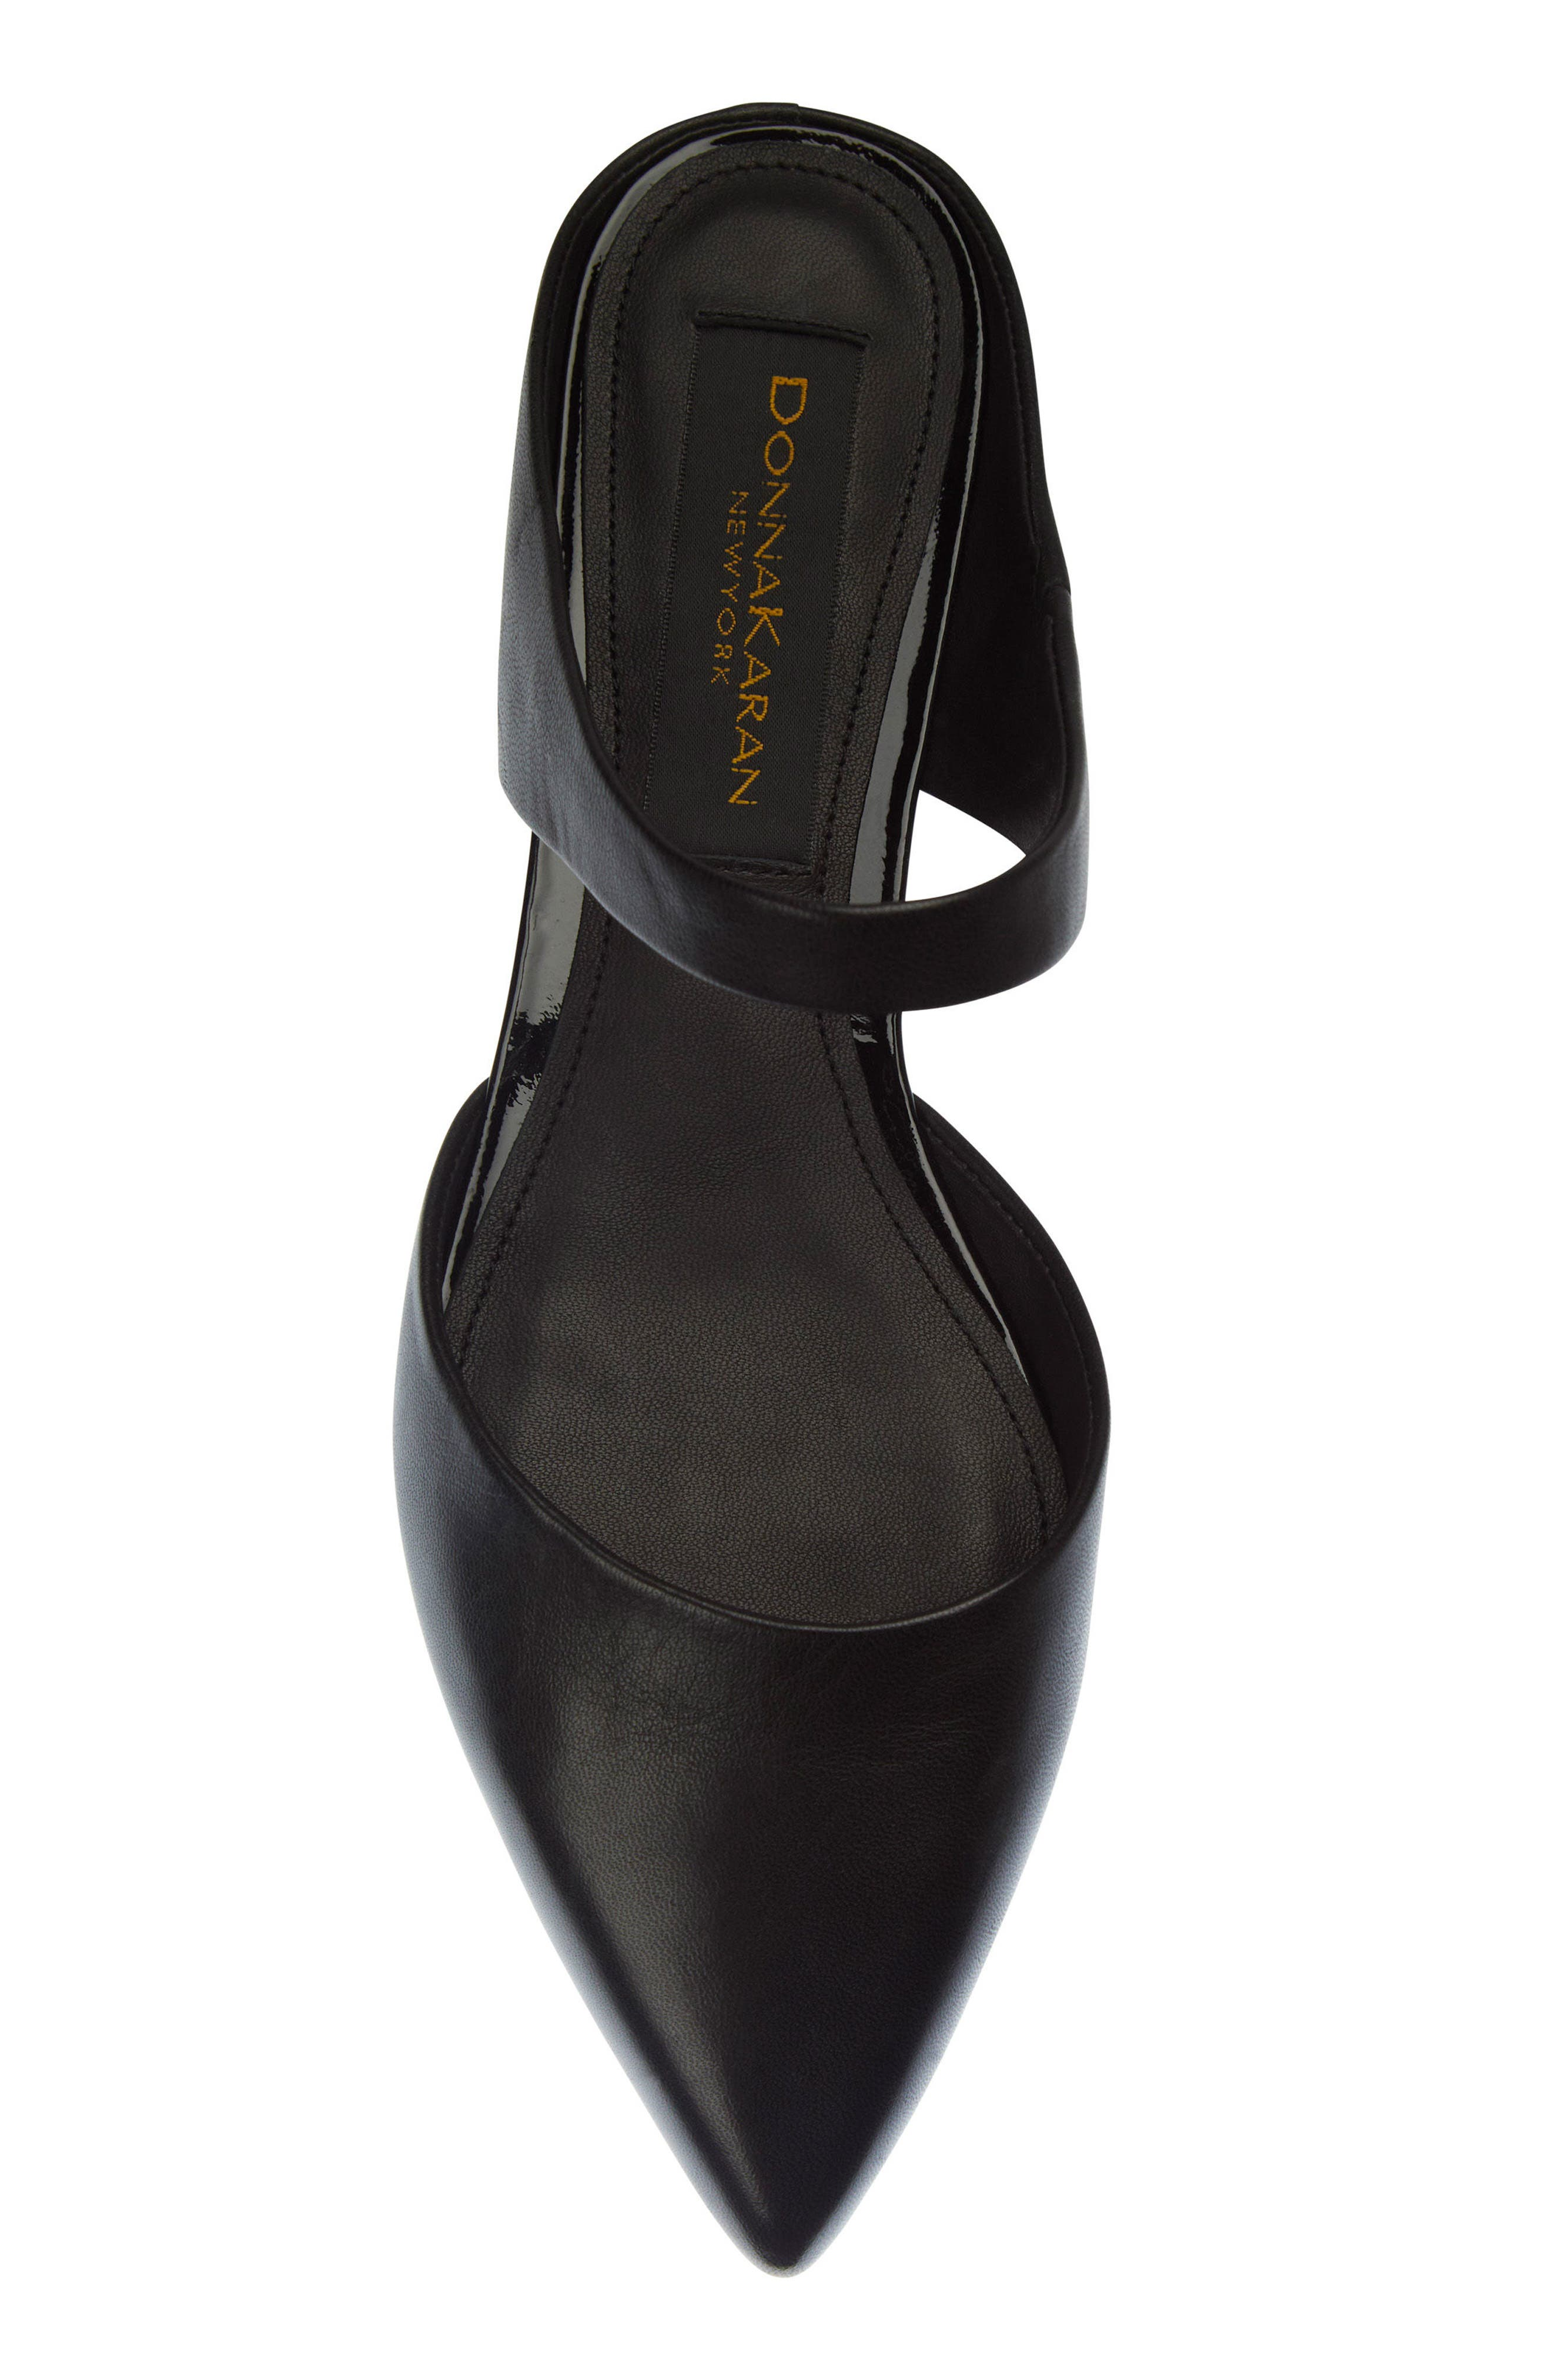 Donna Karan Paris Pointy Toe Mule,                             Alternate thumbnail 5, color,                             Black Leather